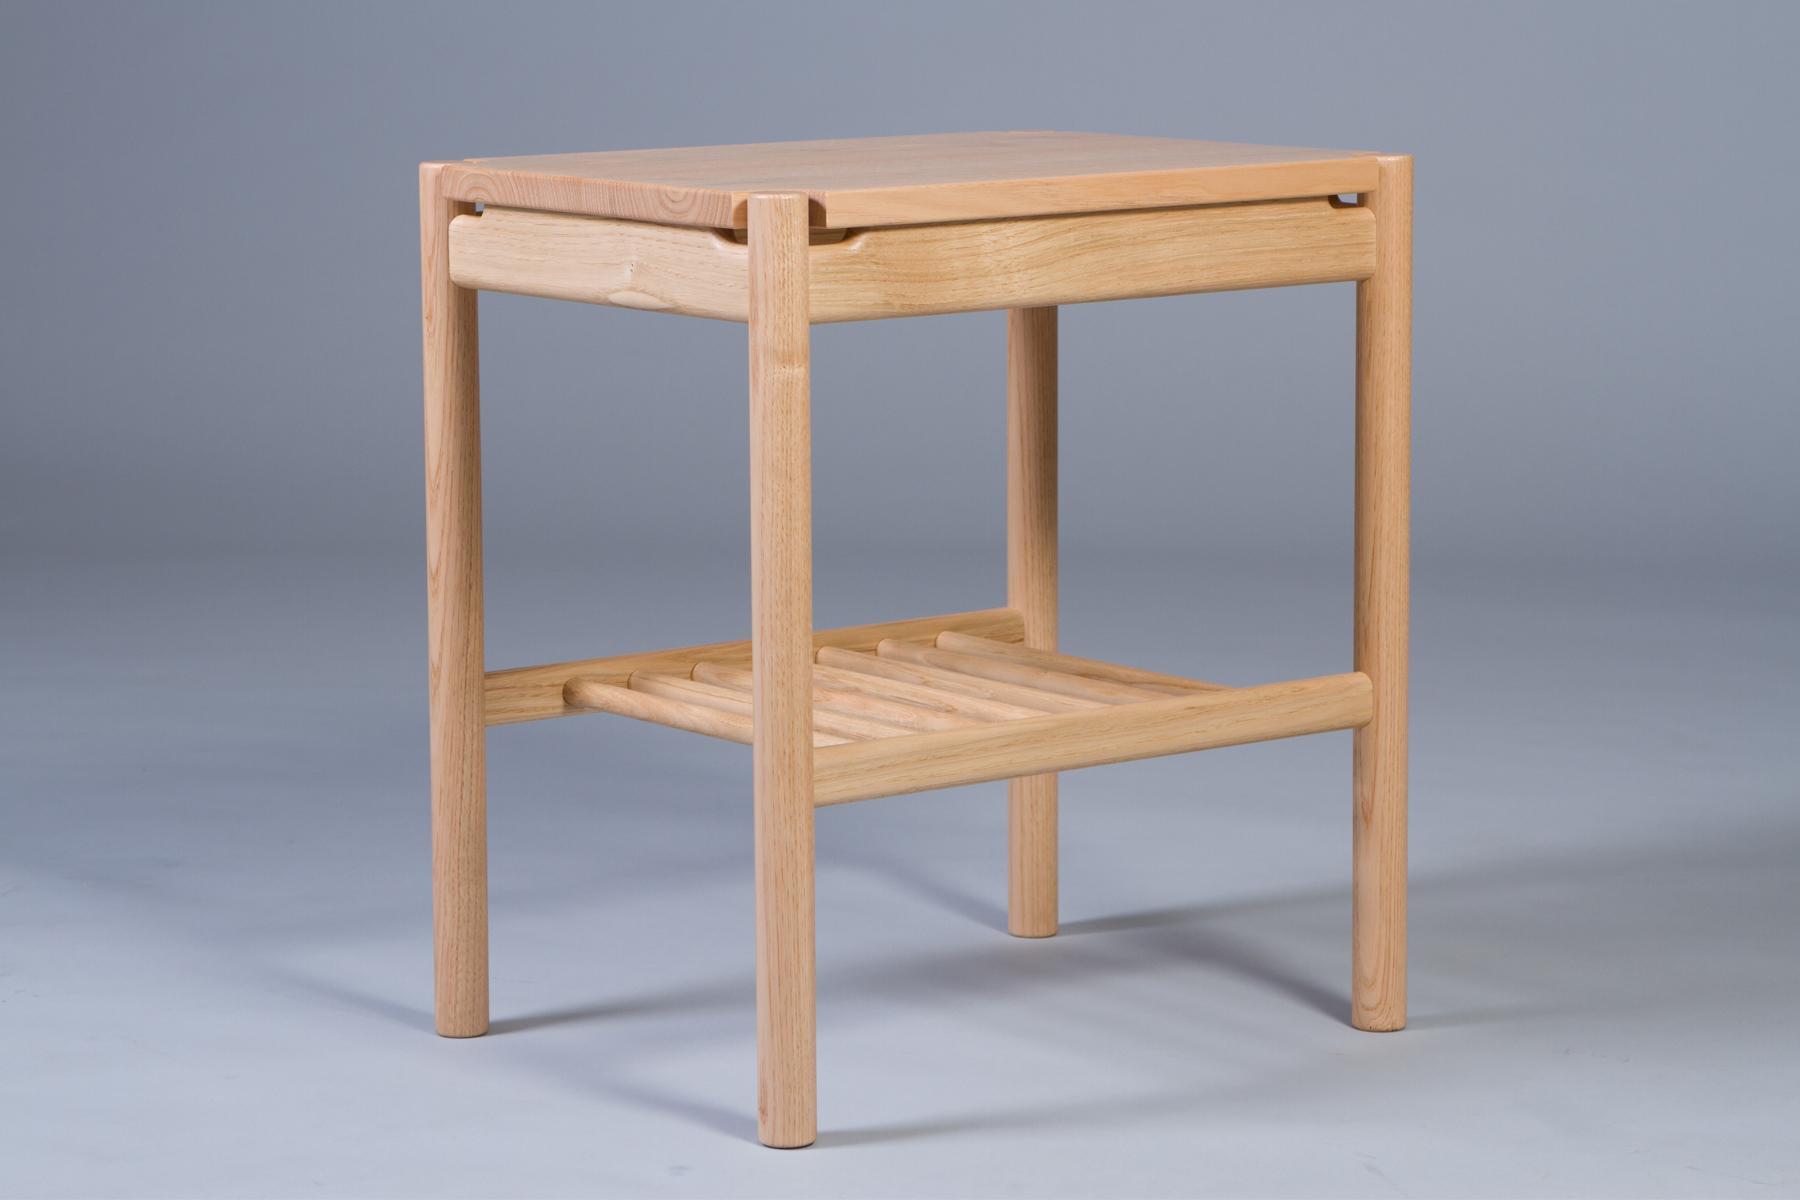 English sweet chestnut handmade bedside tables